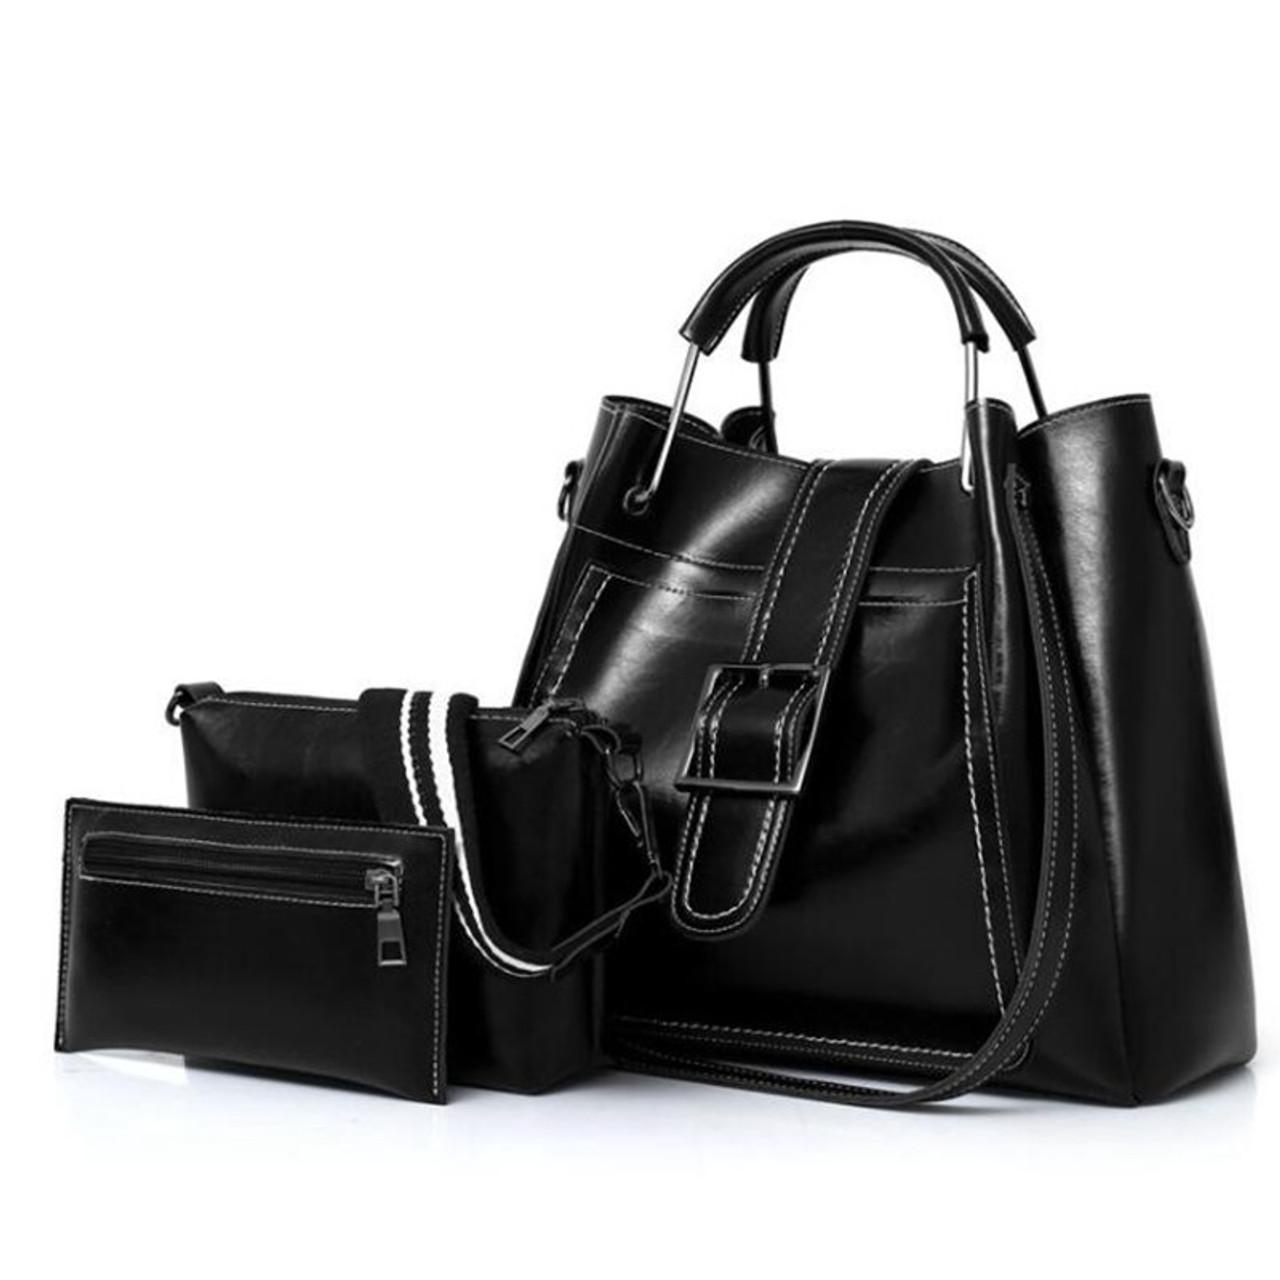 c8dbd56ca03 Women's Messenger Bag Women Bags Leather Luxury Handbags Famous Brands  Female Shoulder Bags Designer Crossbody Bags For LW-171